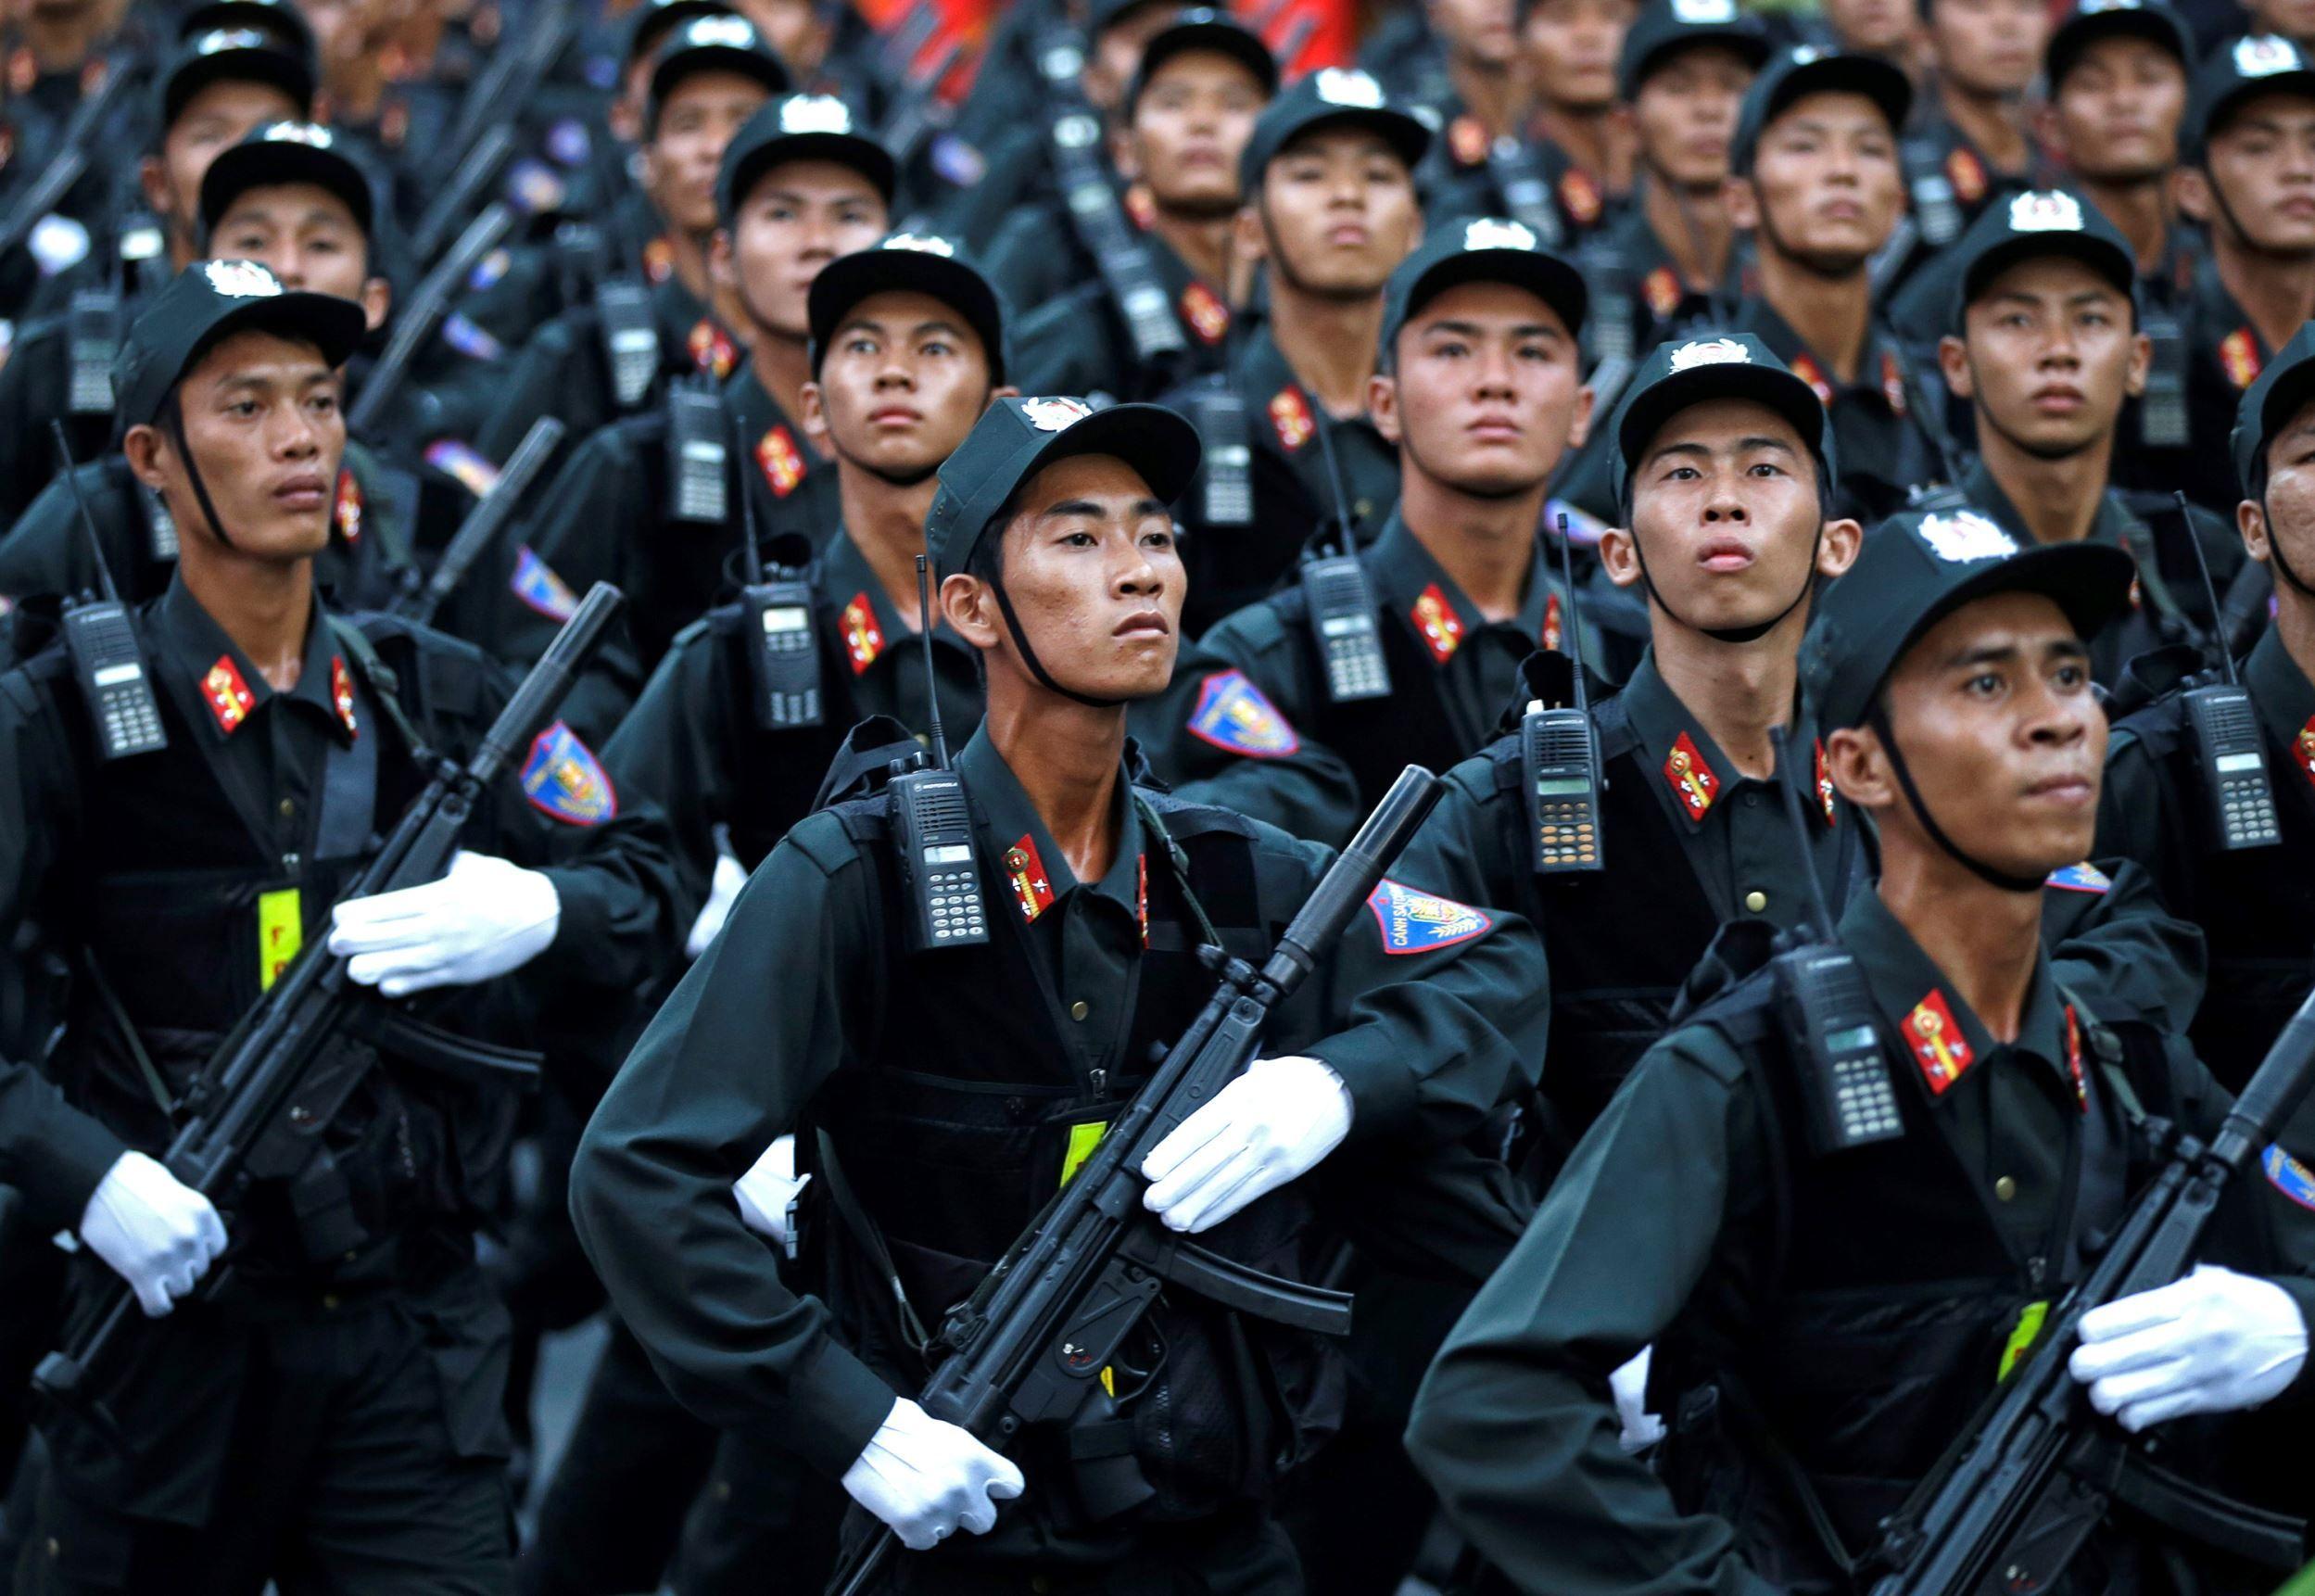 Photos: Vietnam marks 40 years since fall of Saigon